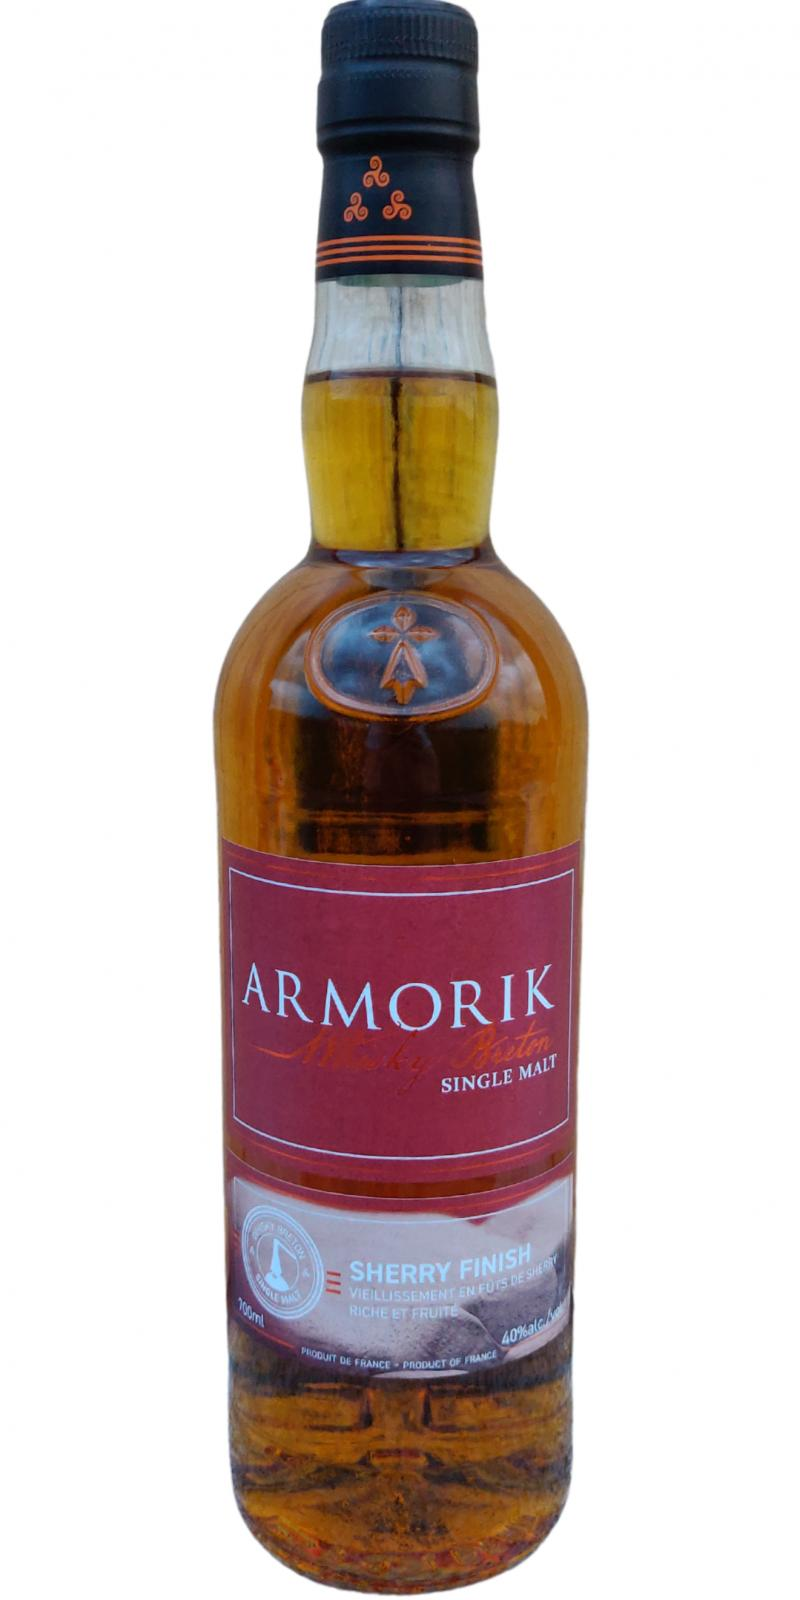 Armorik Sherry Finish